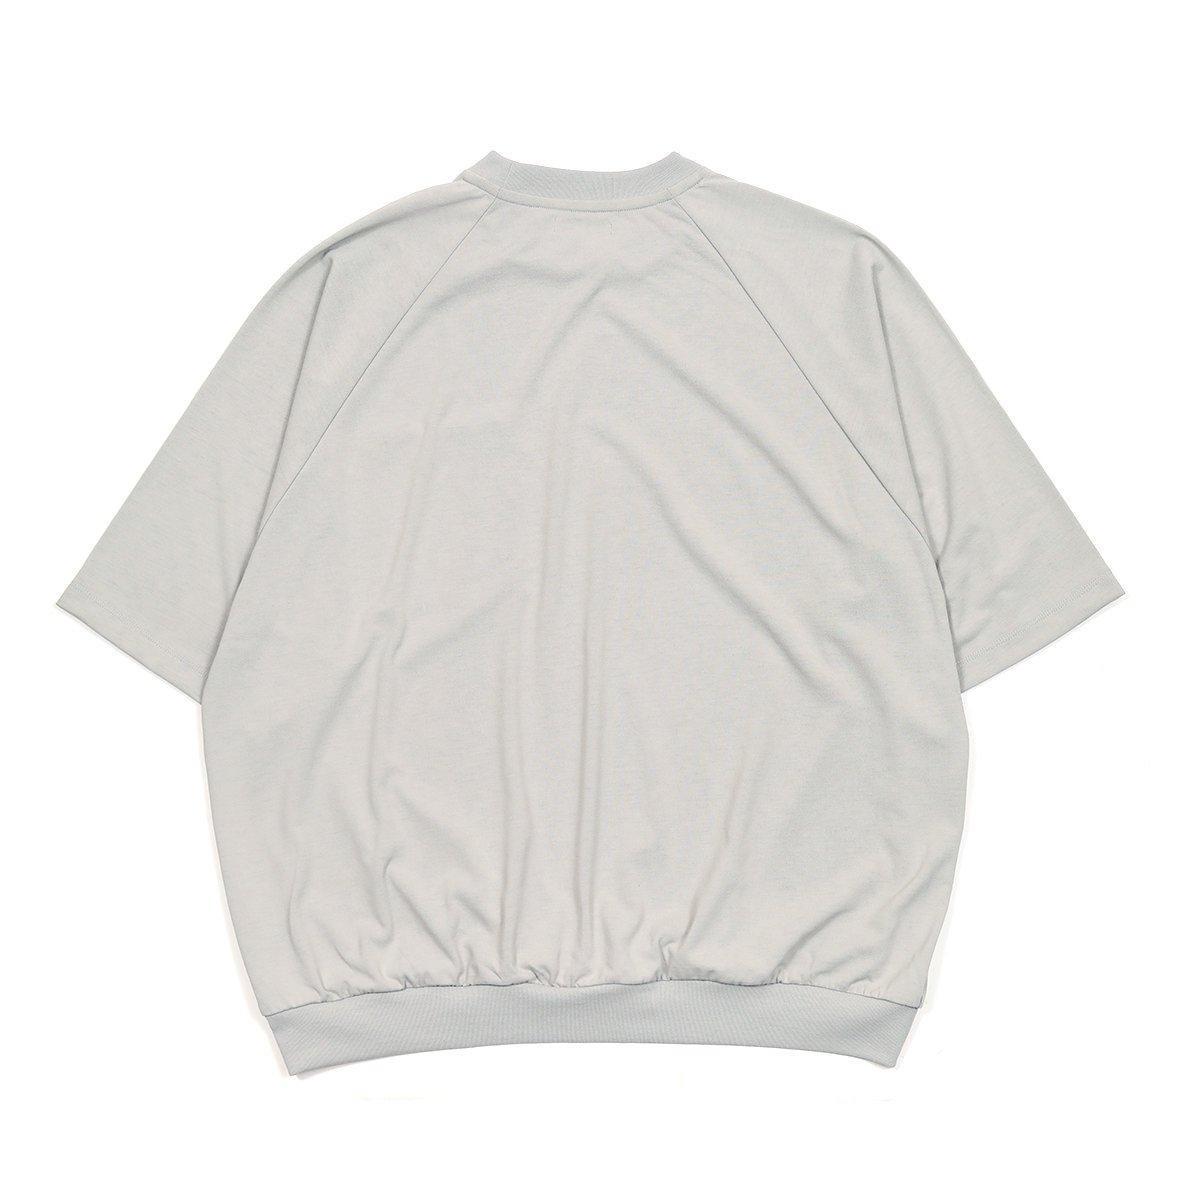 Short Sleeve RIB T-shirts 詳細画像18